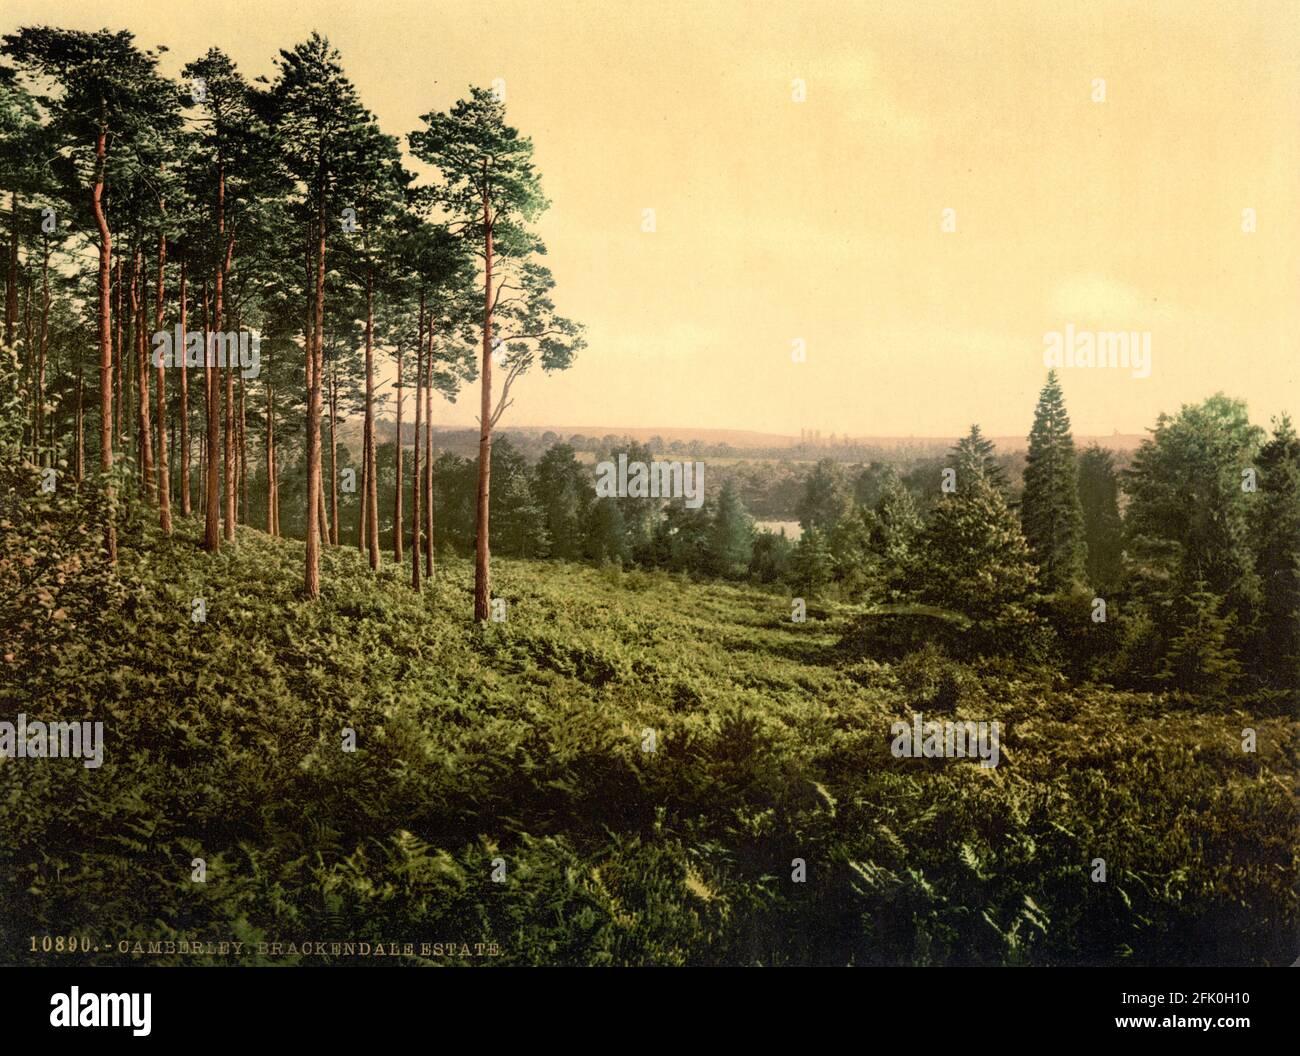 Brackendale Estate, Camberley in Surrey um 1890-1900 Stockfoto